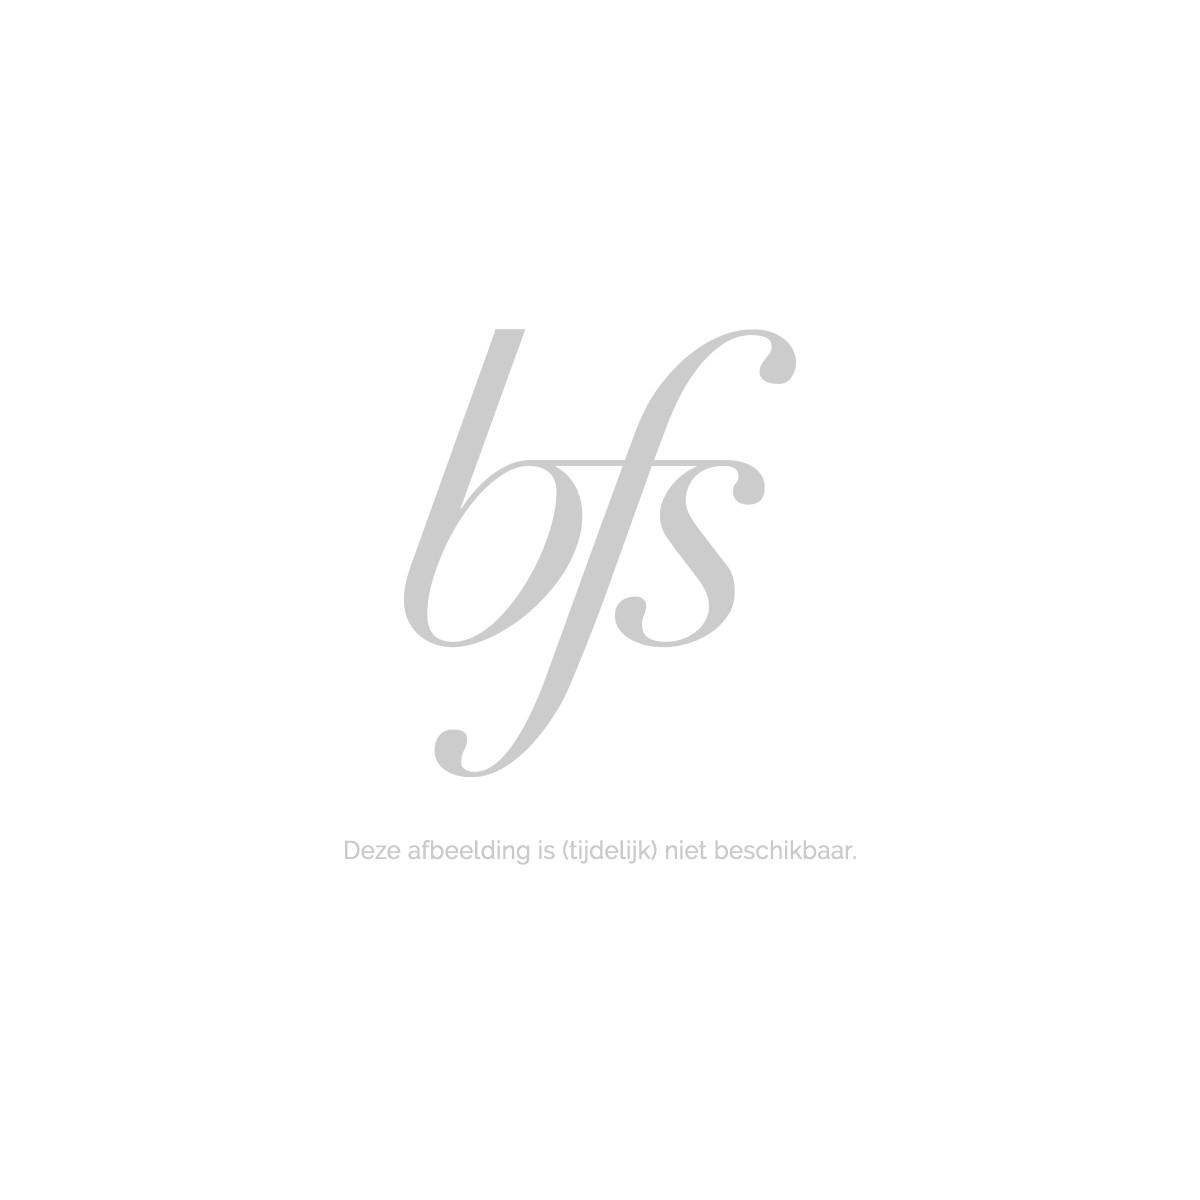 The Knot Dr. Pro Brite Fuchsia Black Pad Haarborstel